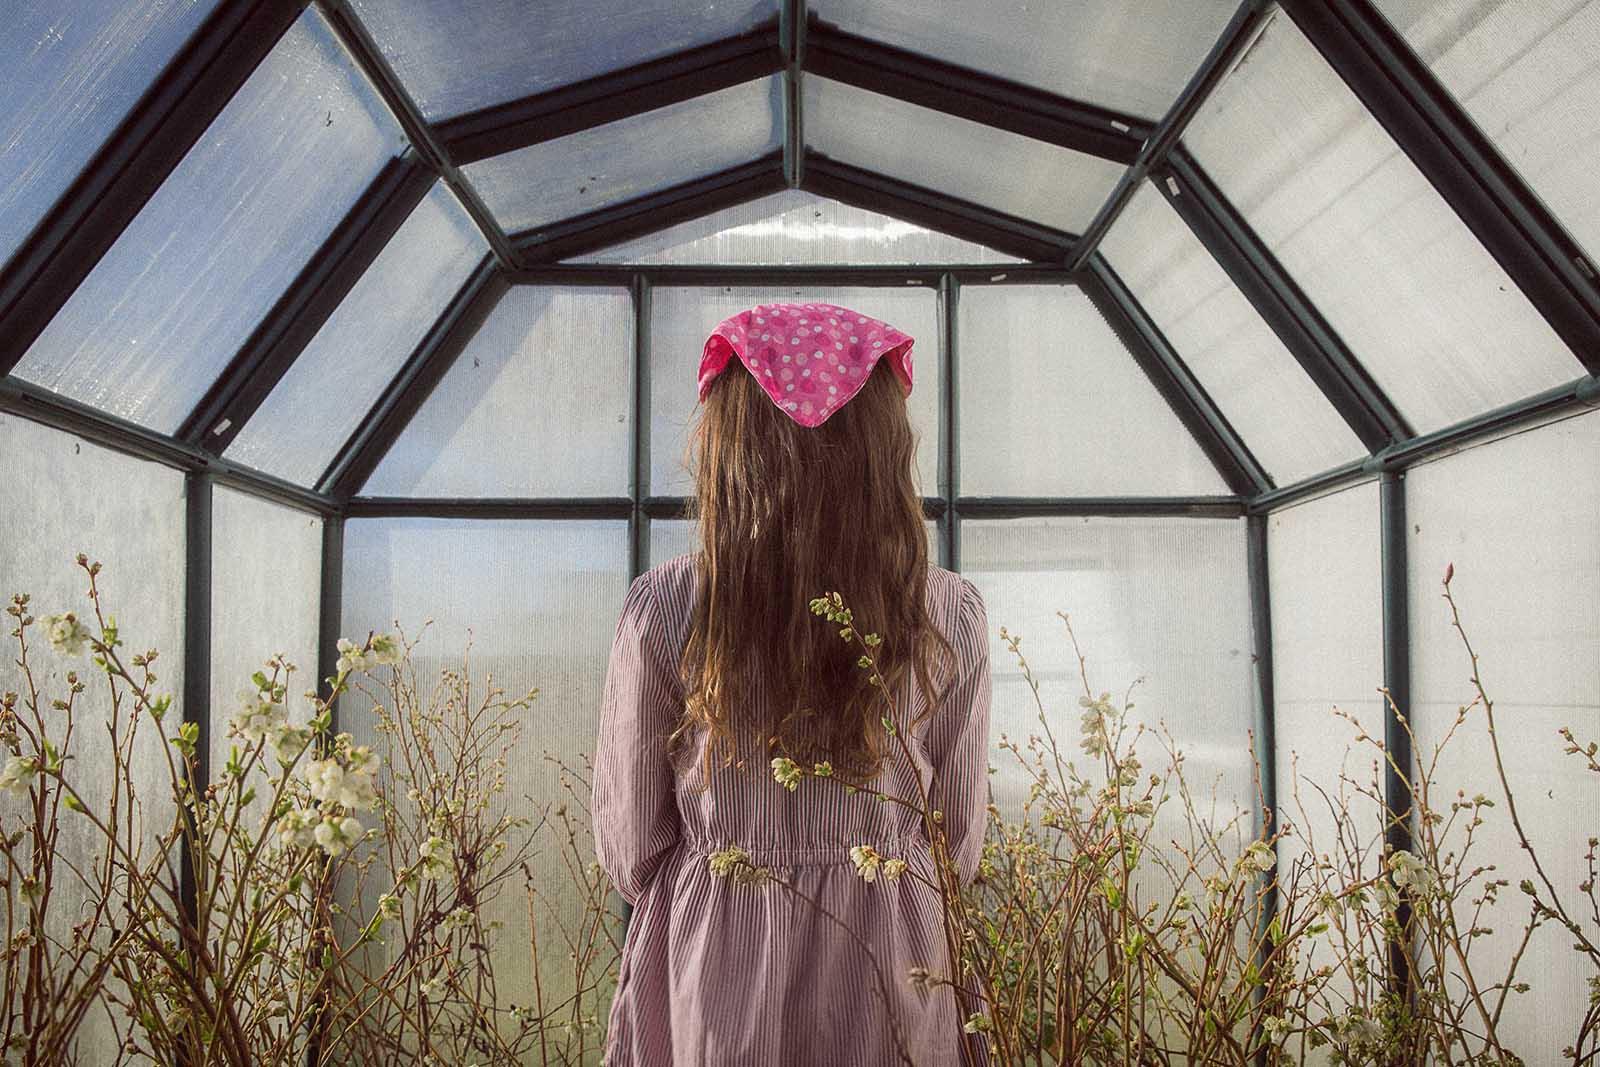 Zoe Mackenzie- Prolific female photographer